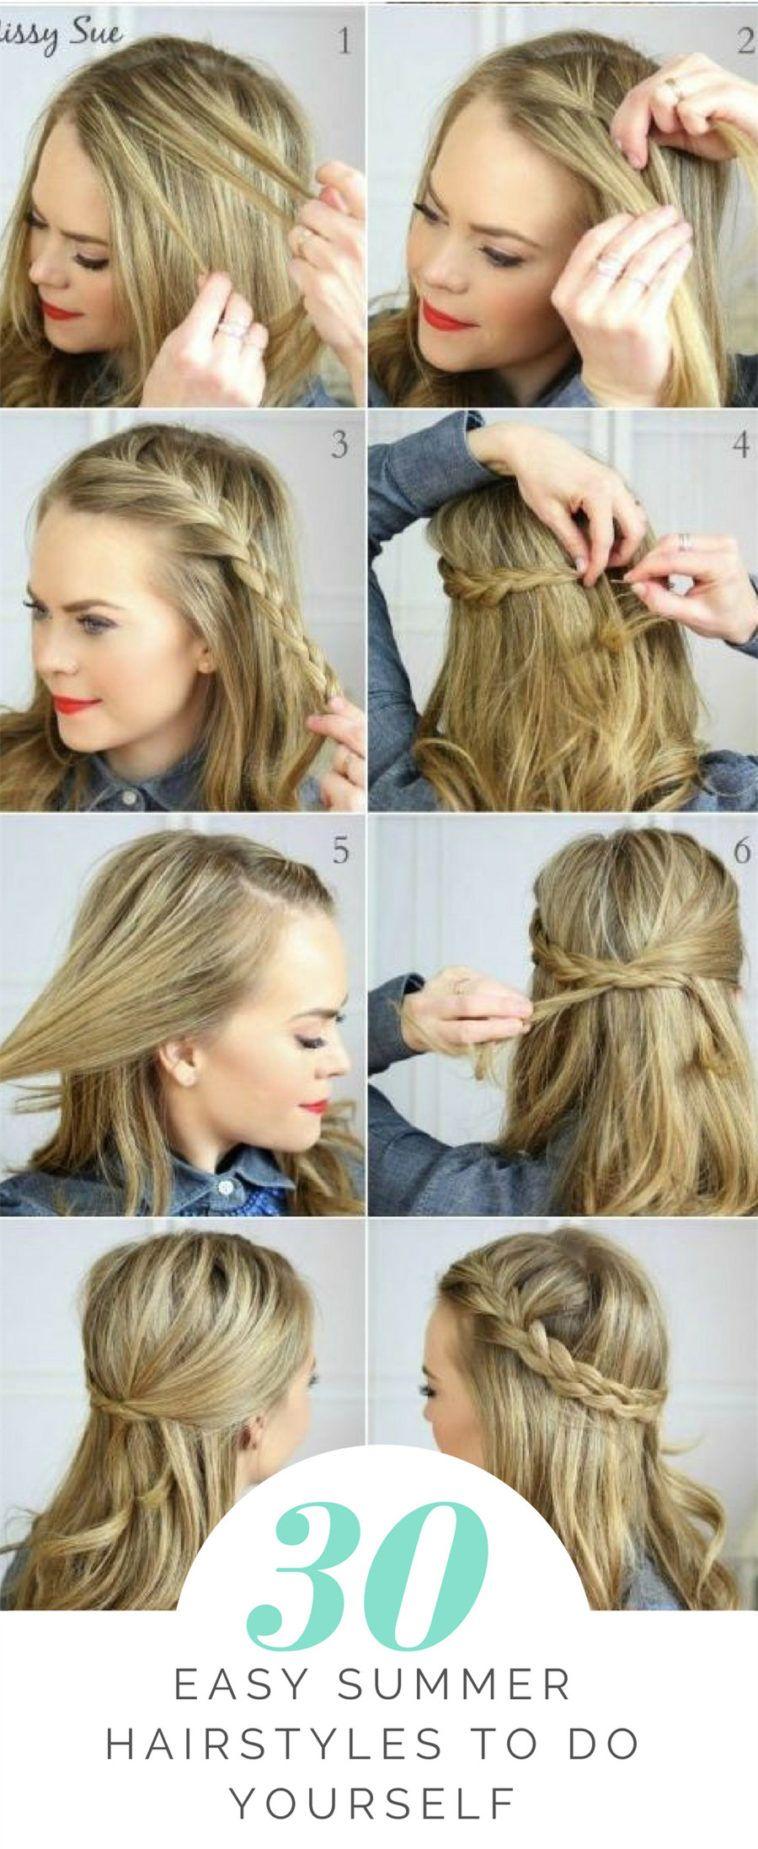 30 Easy Summer Hairstyles To Do Yourself Easy Hairstyles For Medium Hair Hair Lengths Hair Tutorials Easy